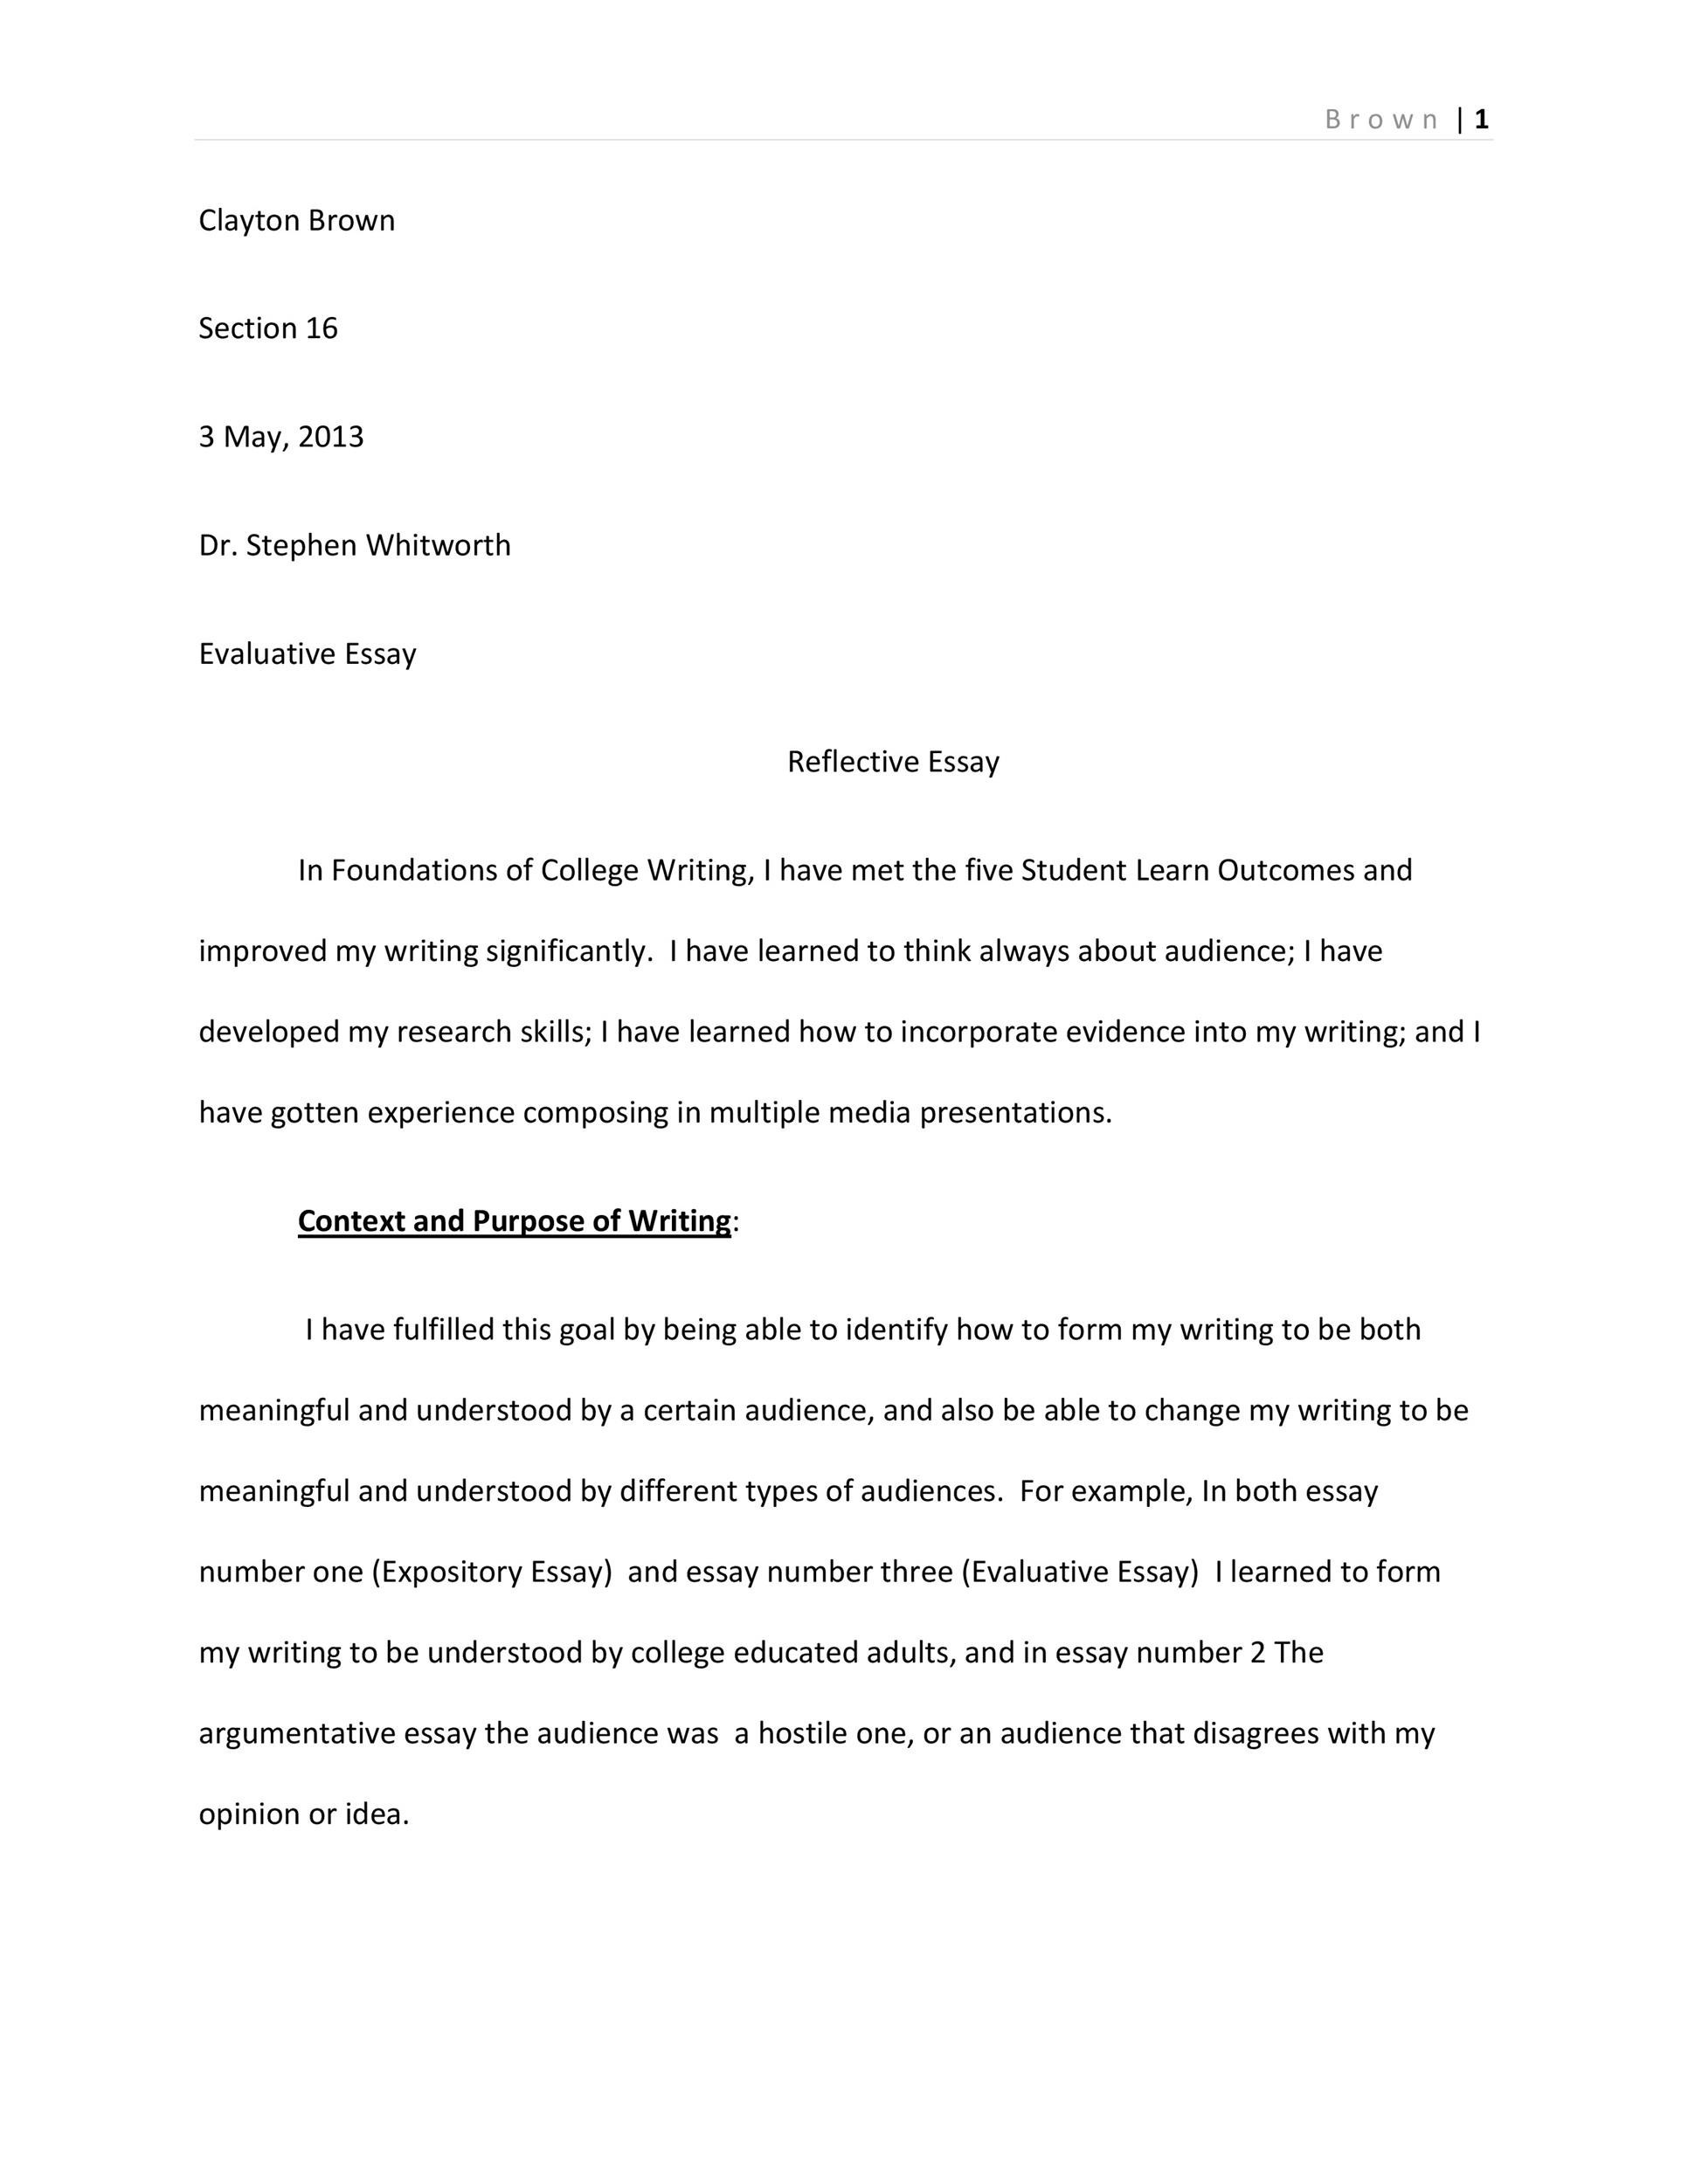 Free reflective essay example 08